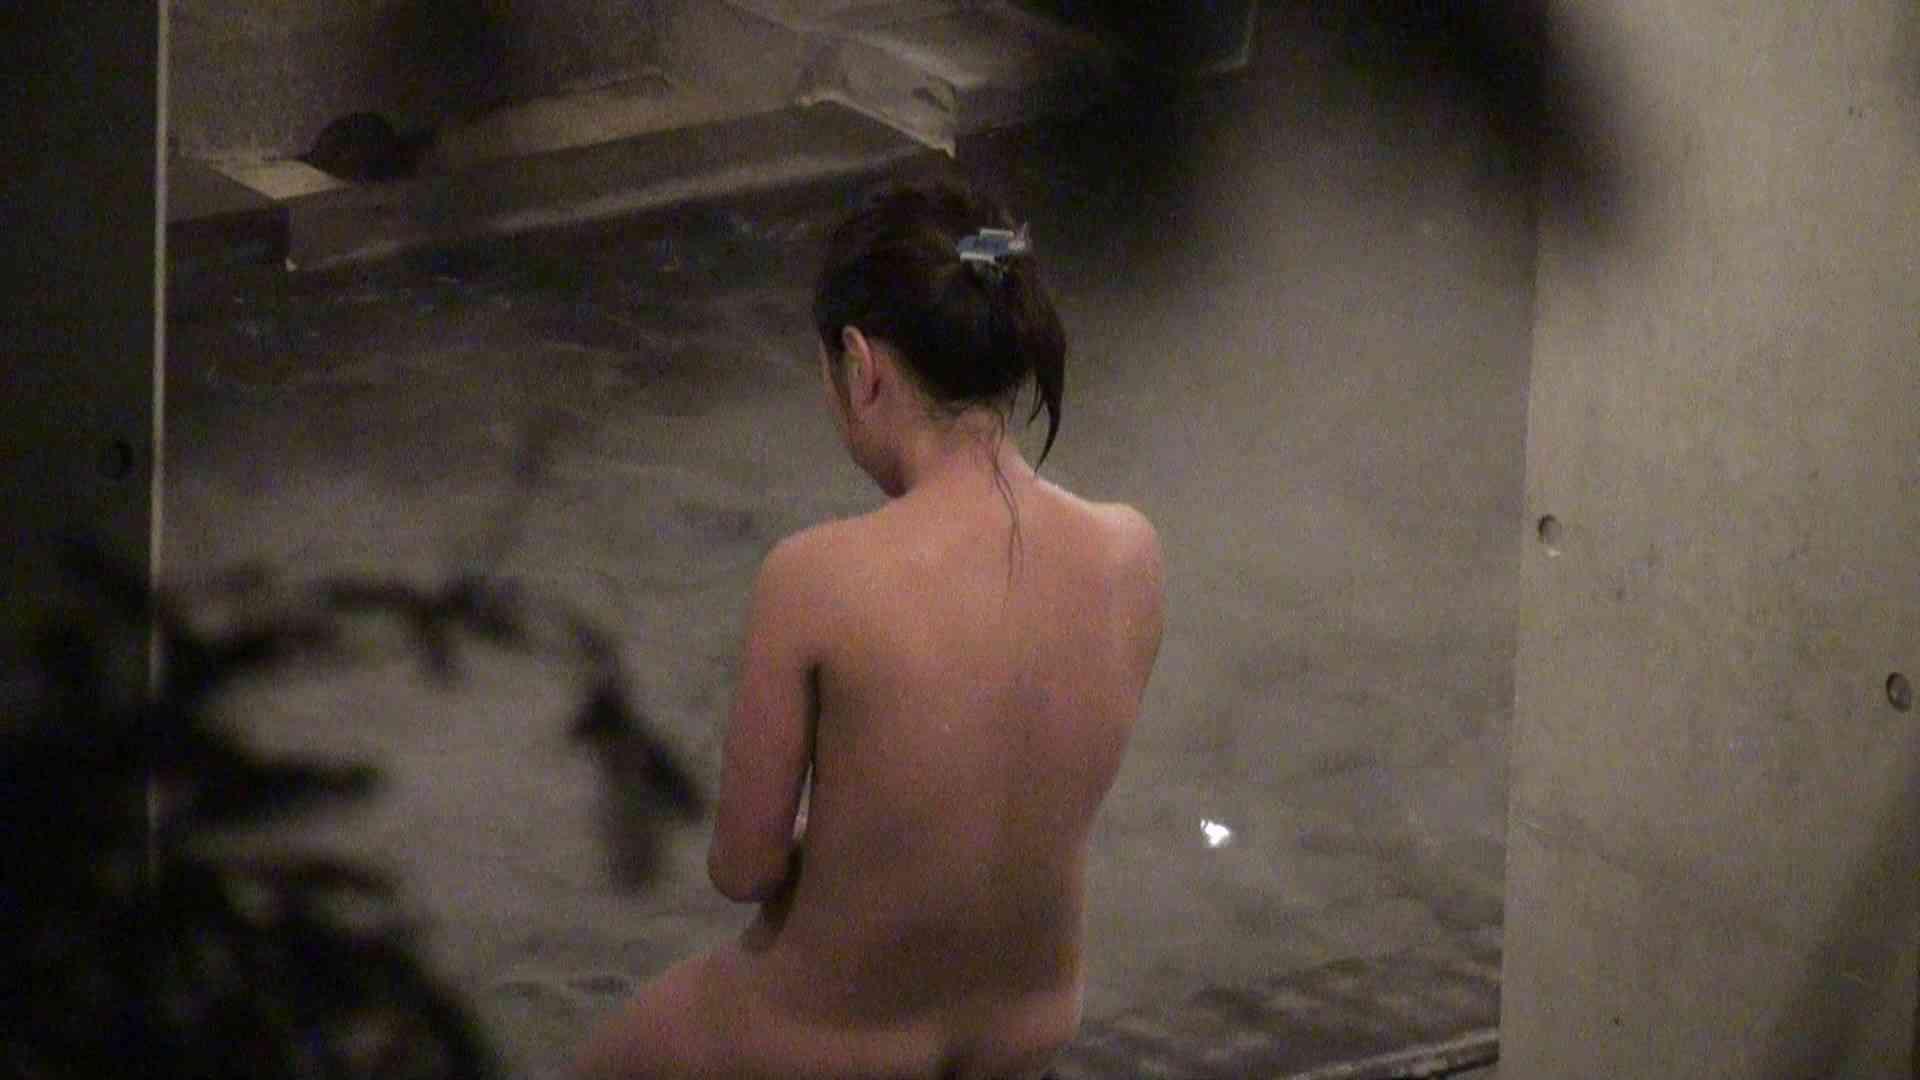 Aquaな露天風呂Vol.407 0   0  88連発 51